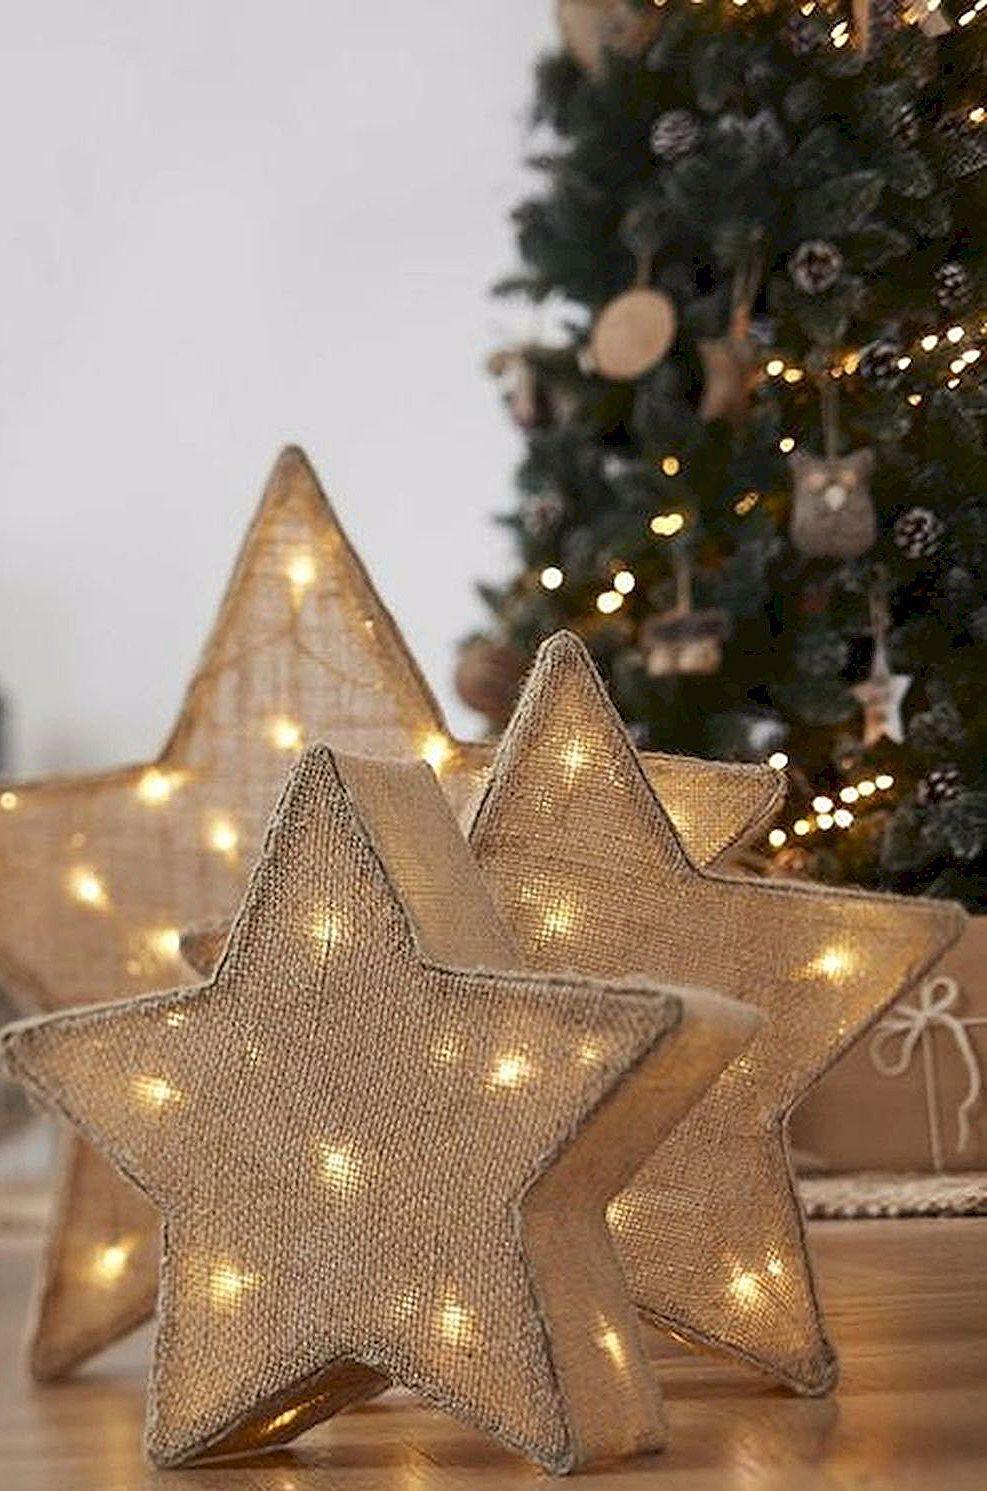 30 Rustic And Vintage Christmas Tree Decor Ideas 14 In 2020 Alternative Christmas Tree Vintage Christmas Tree Christmas Tree Decorations